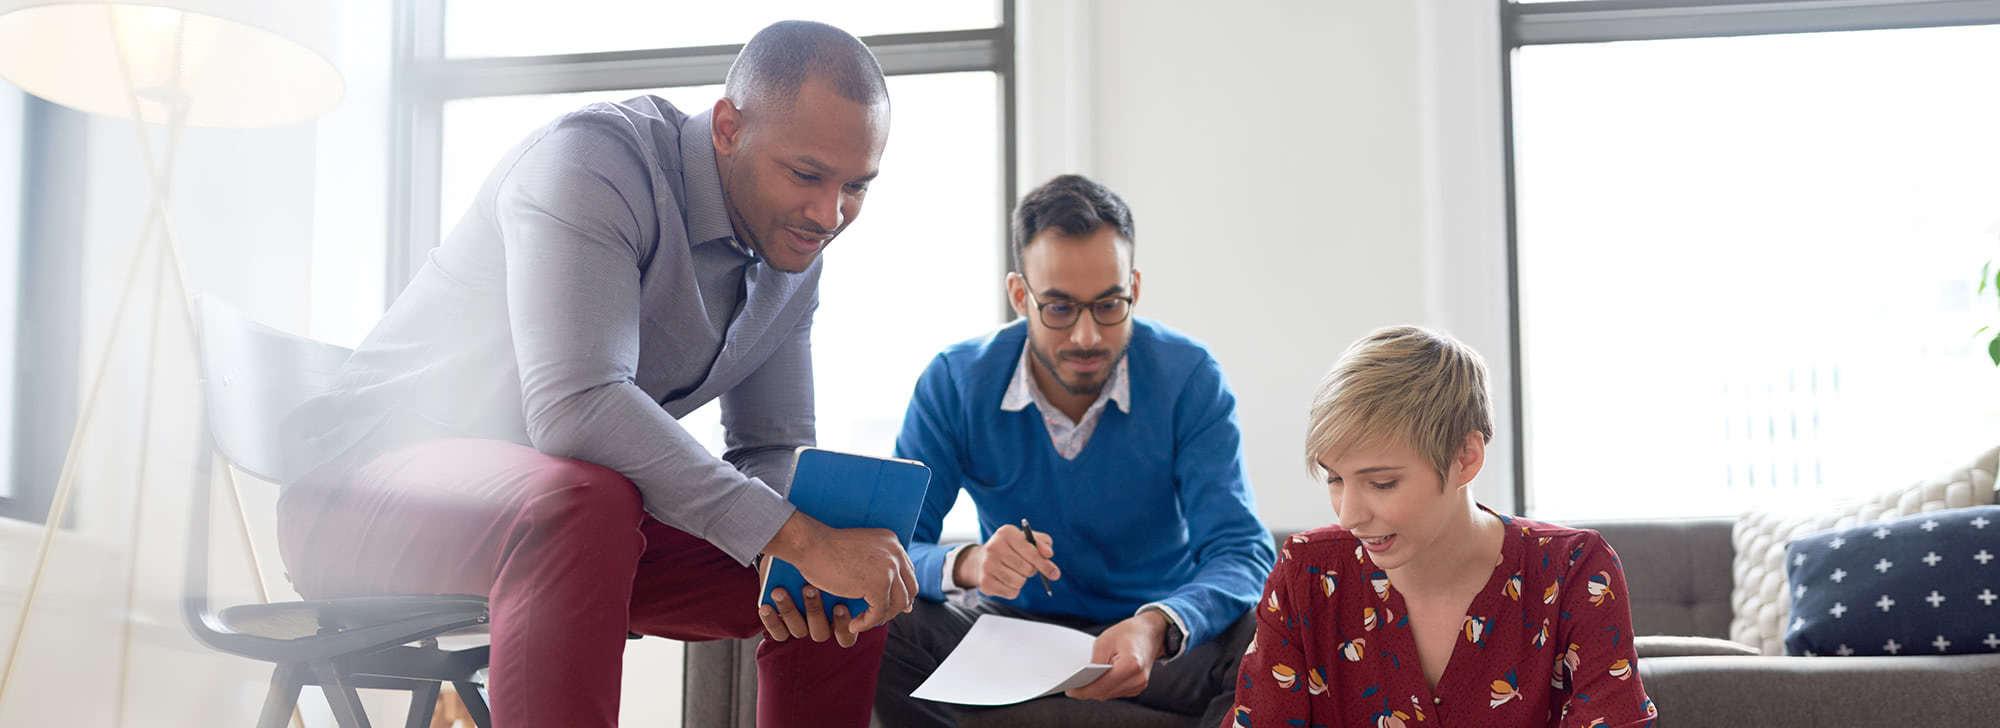 Fierce Conversations Whitepaper Leadership Training Programs